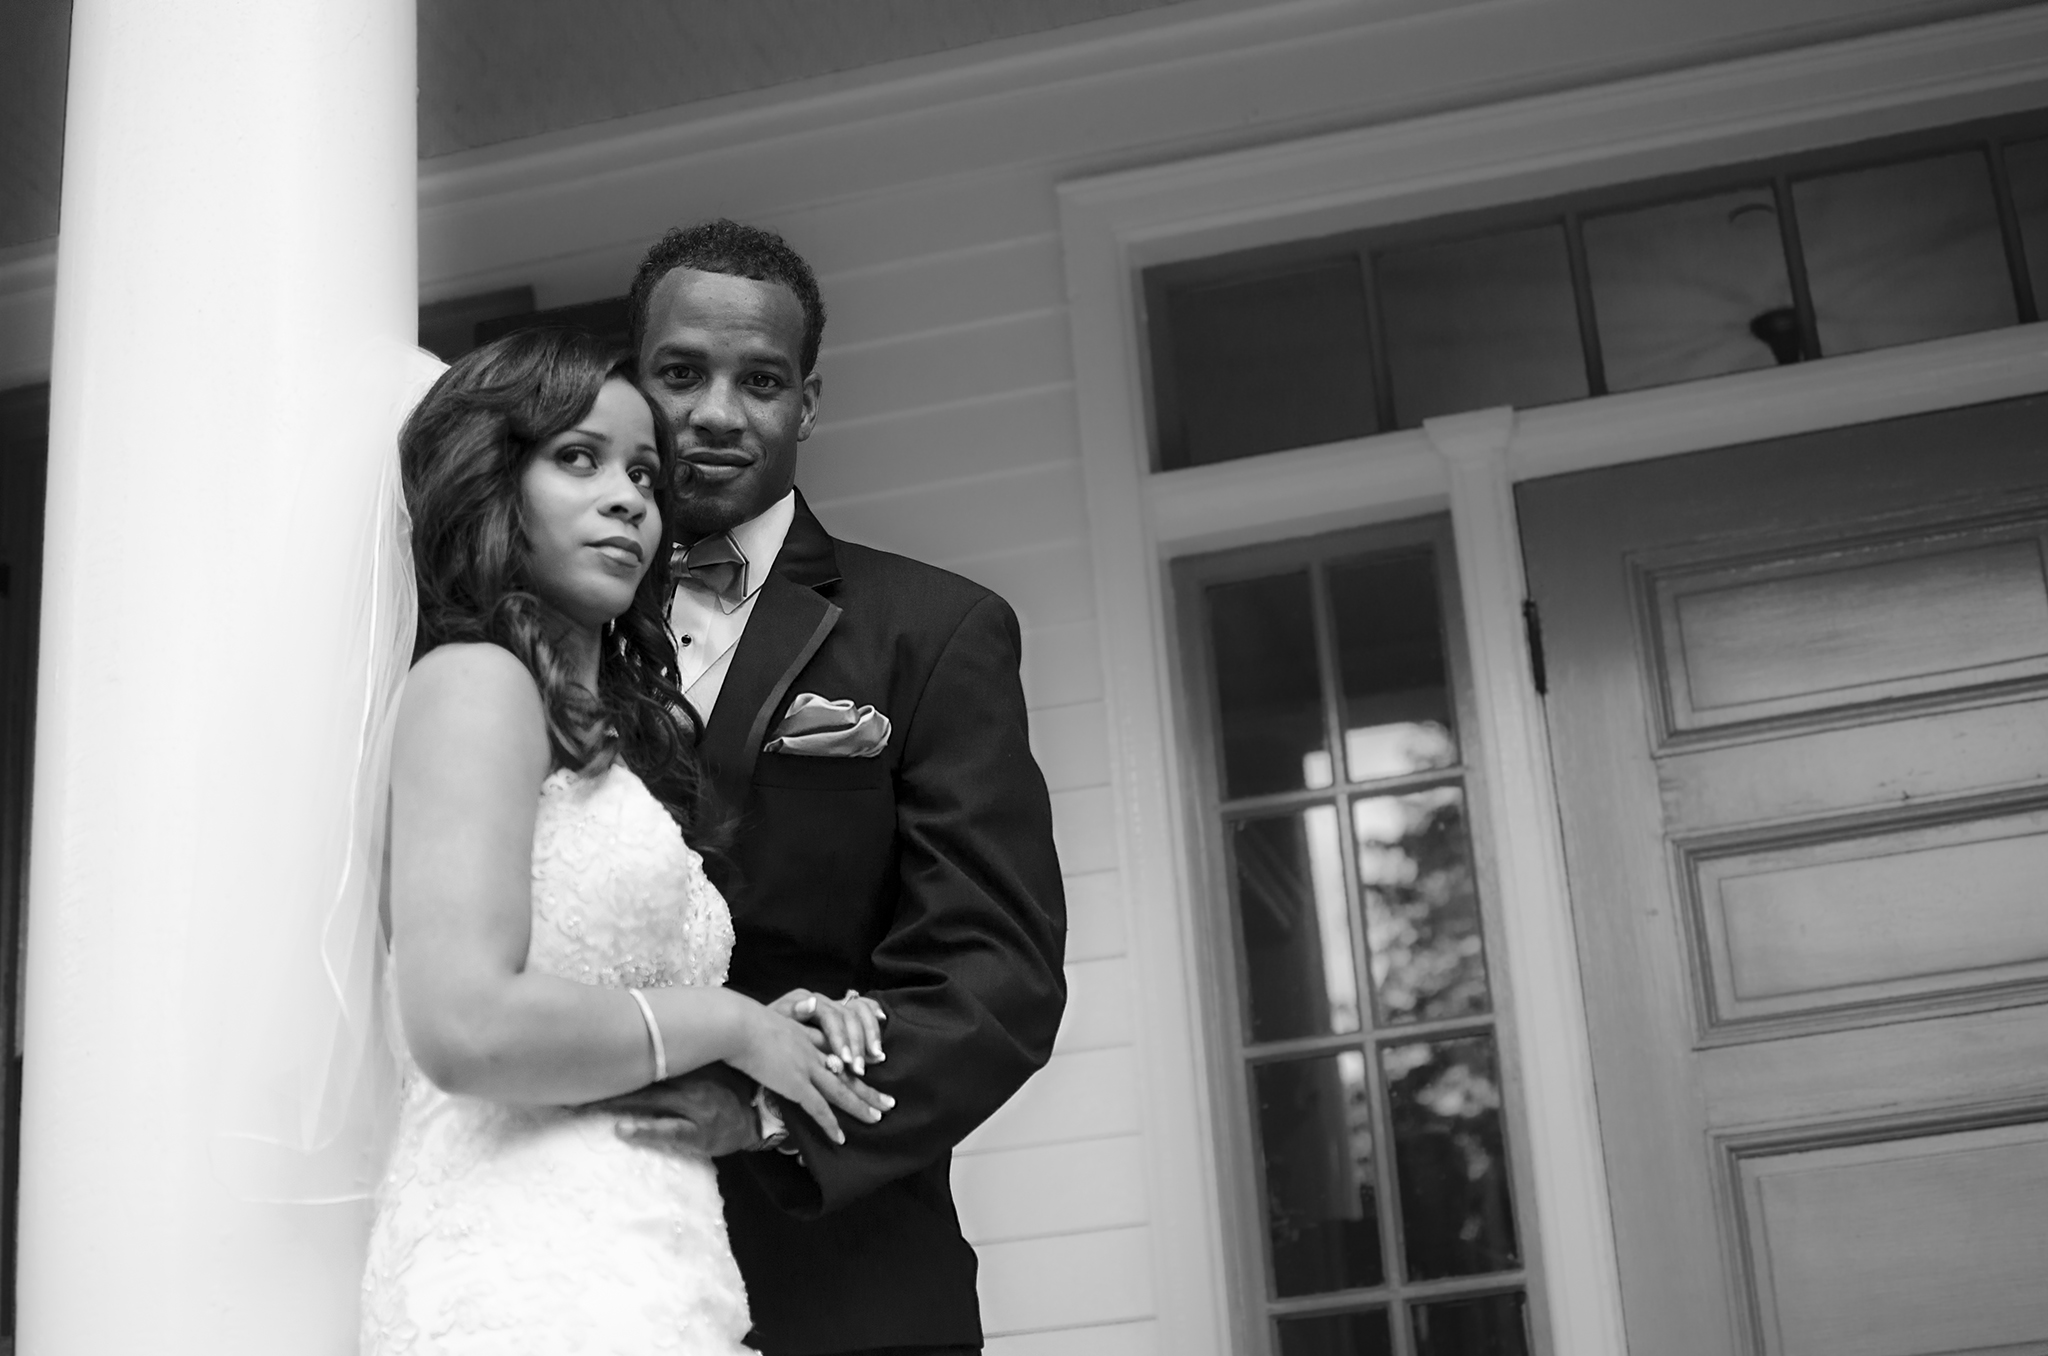 Richmond, Virginia hotel wedding photographer